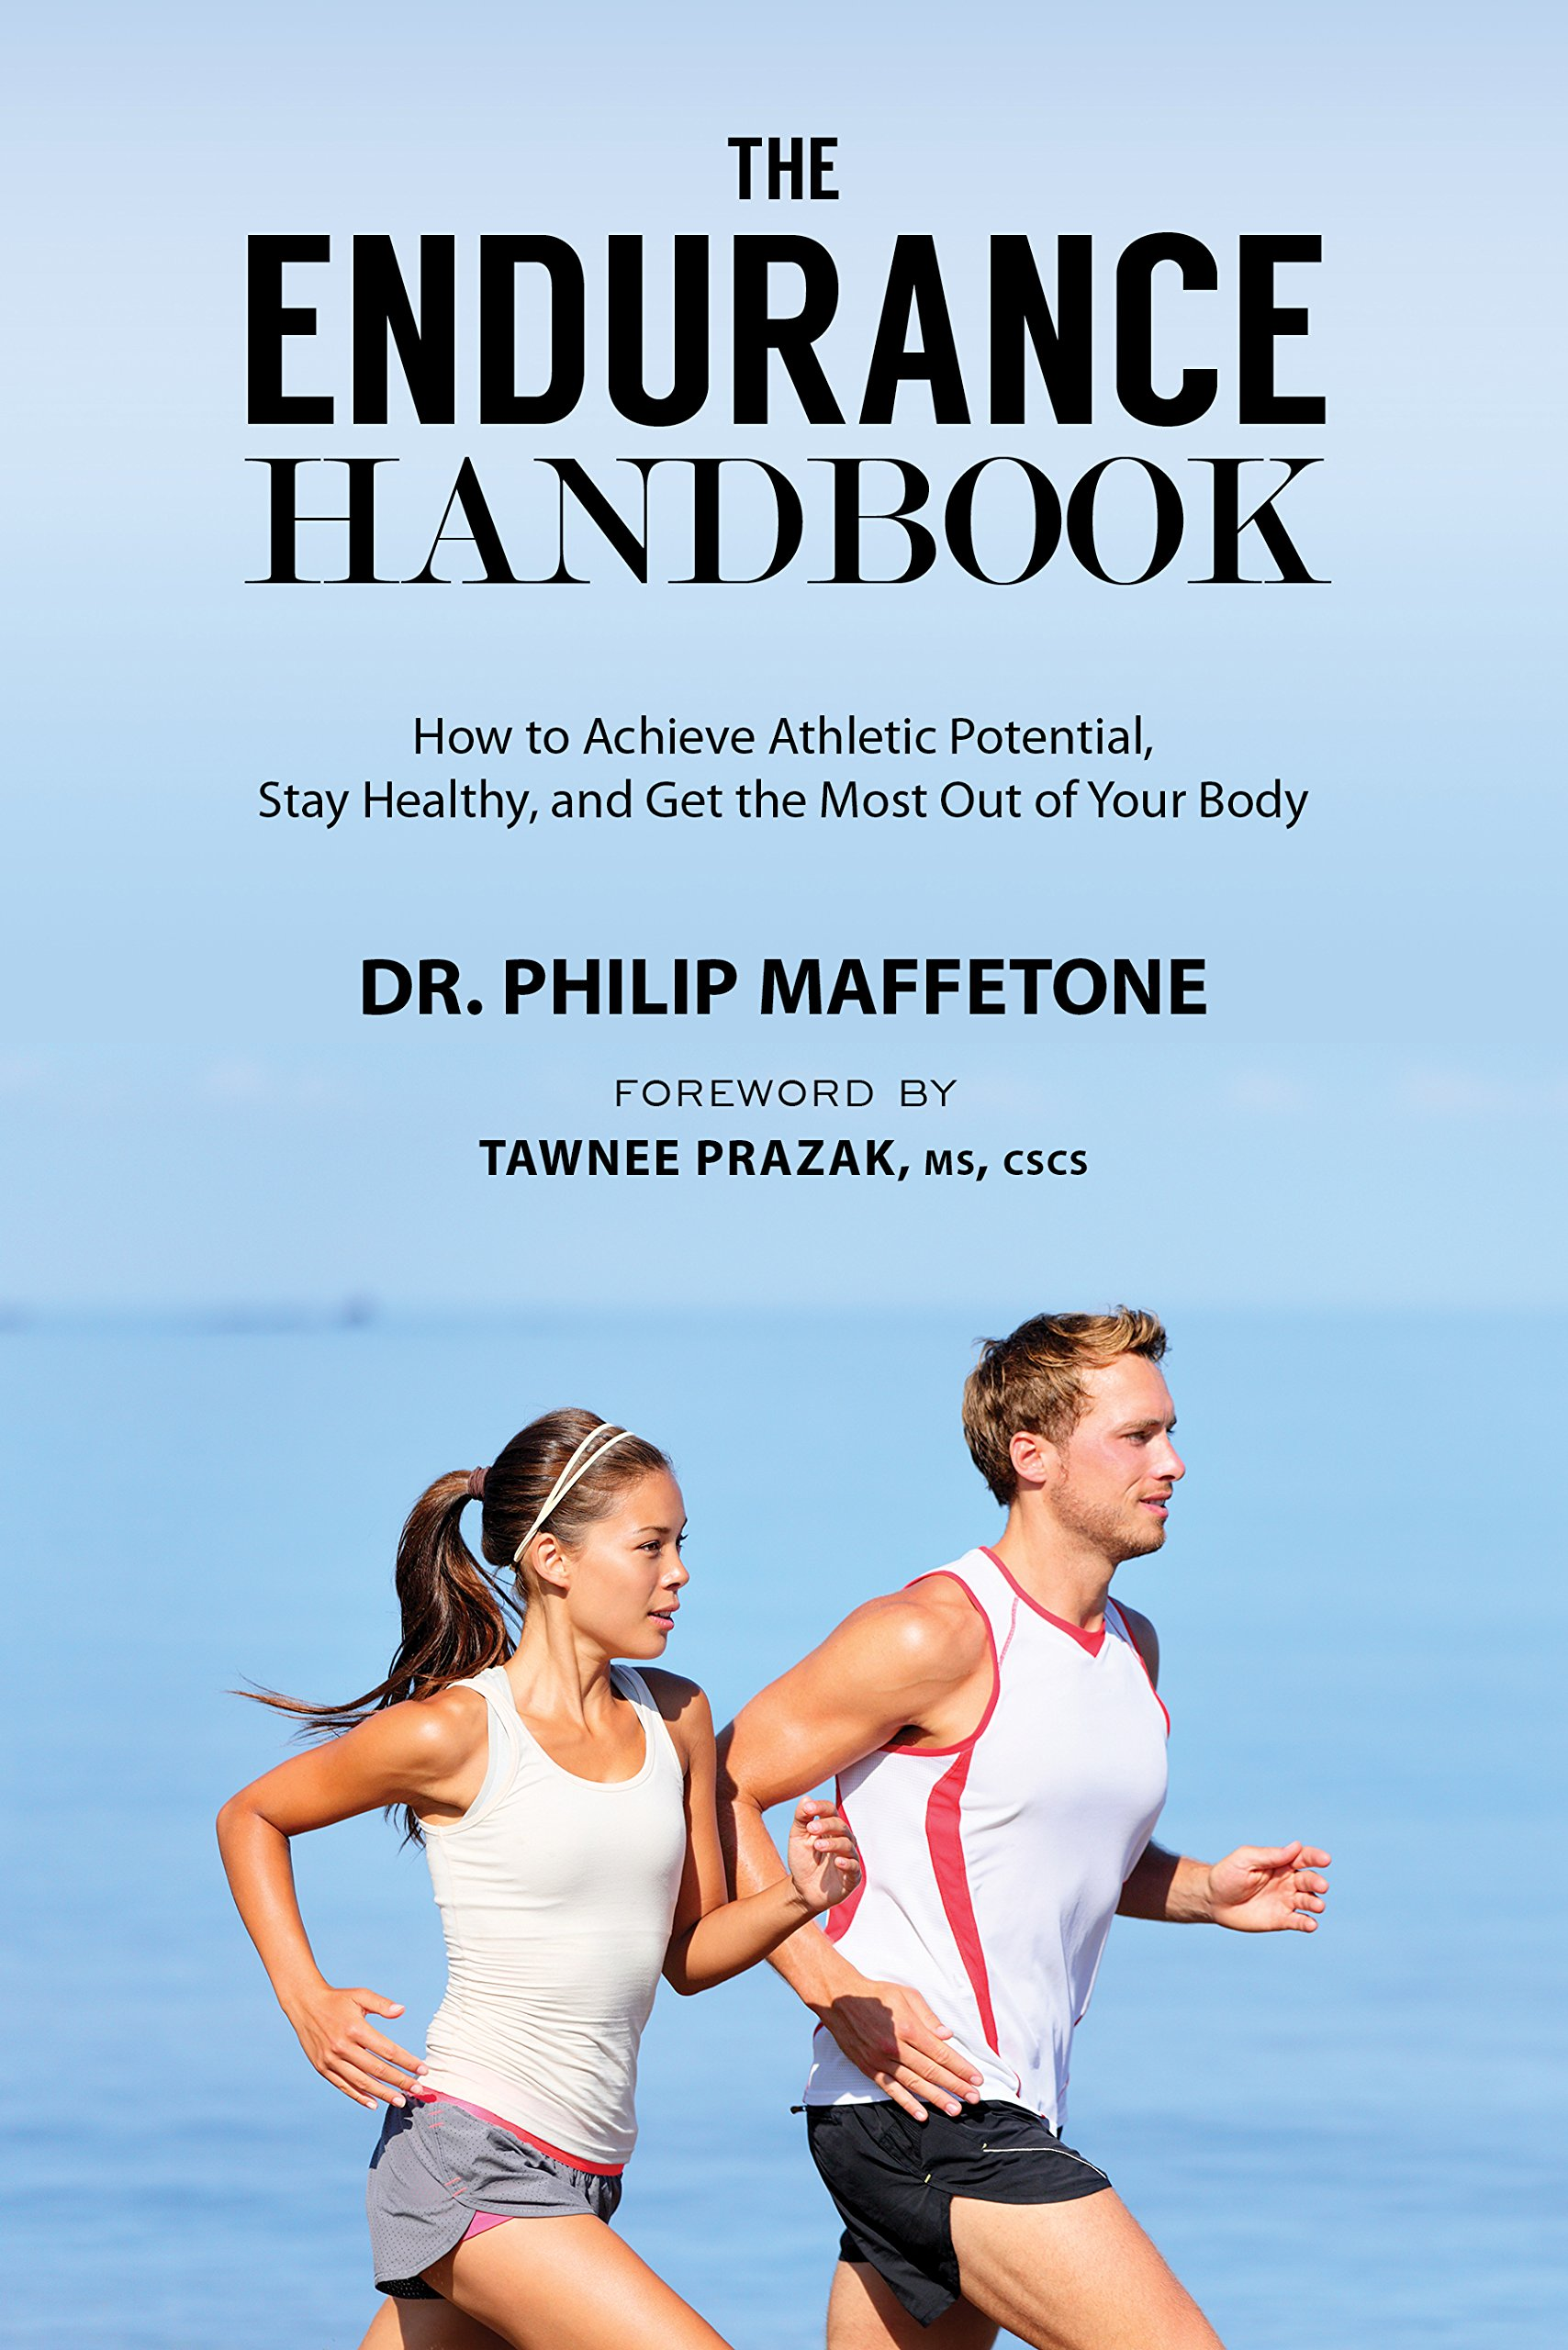 Endurance Handbook Achieve Athletic Potential product image